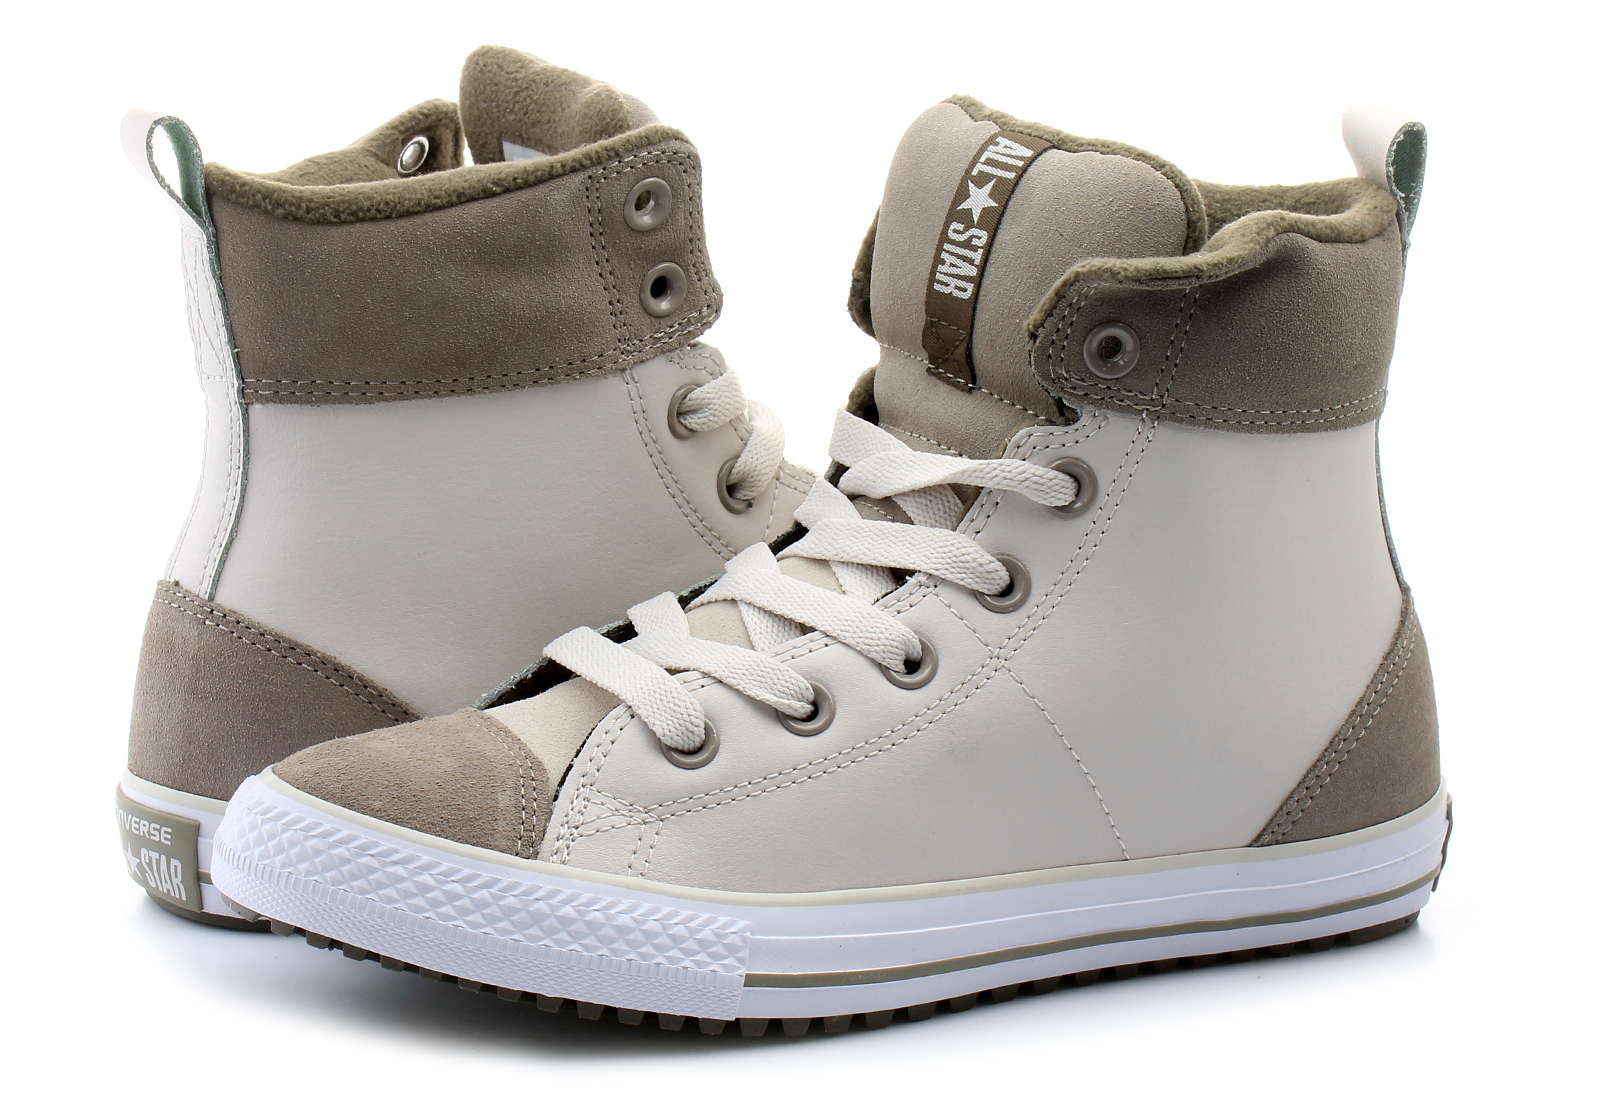 c6d1959a2bf Converse Sneakers - Chuck Taylor All Star Asphalt Boot - 658068C ...